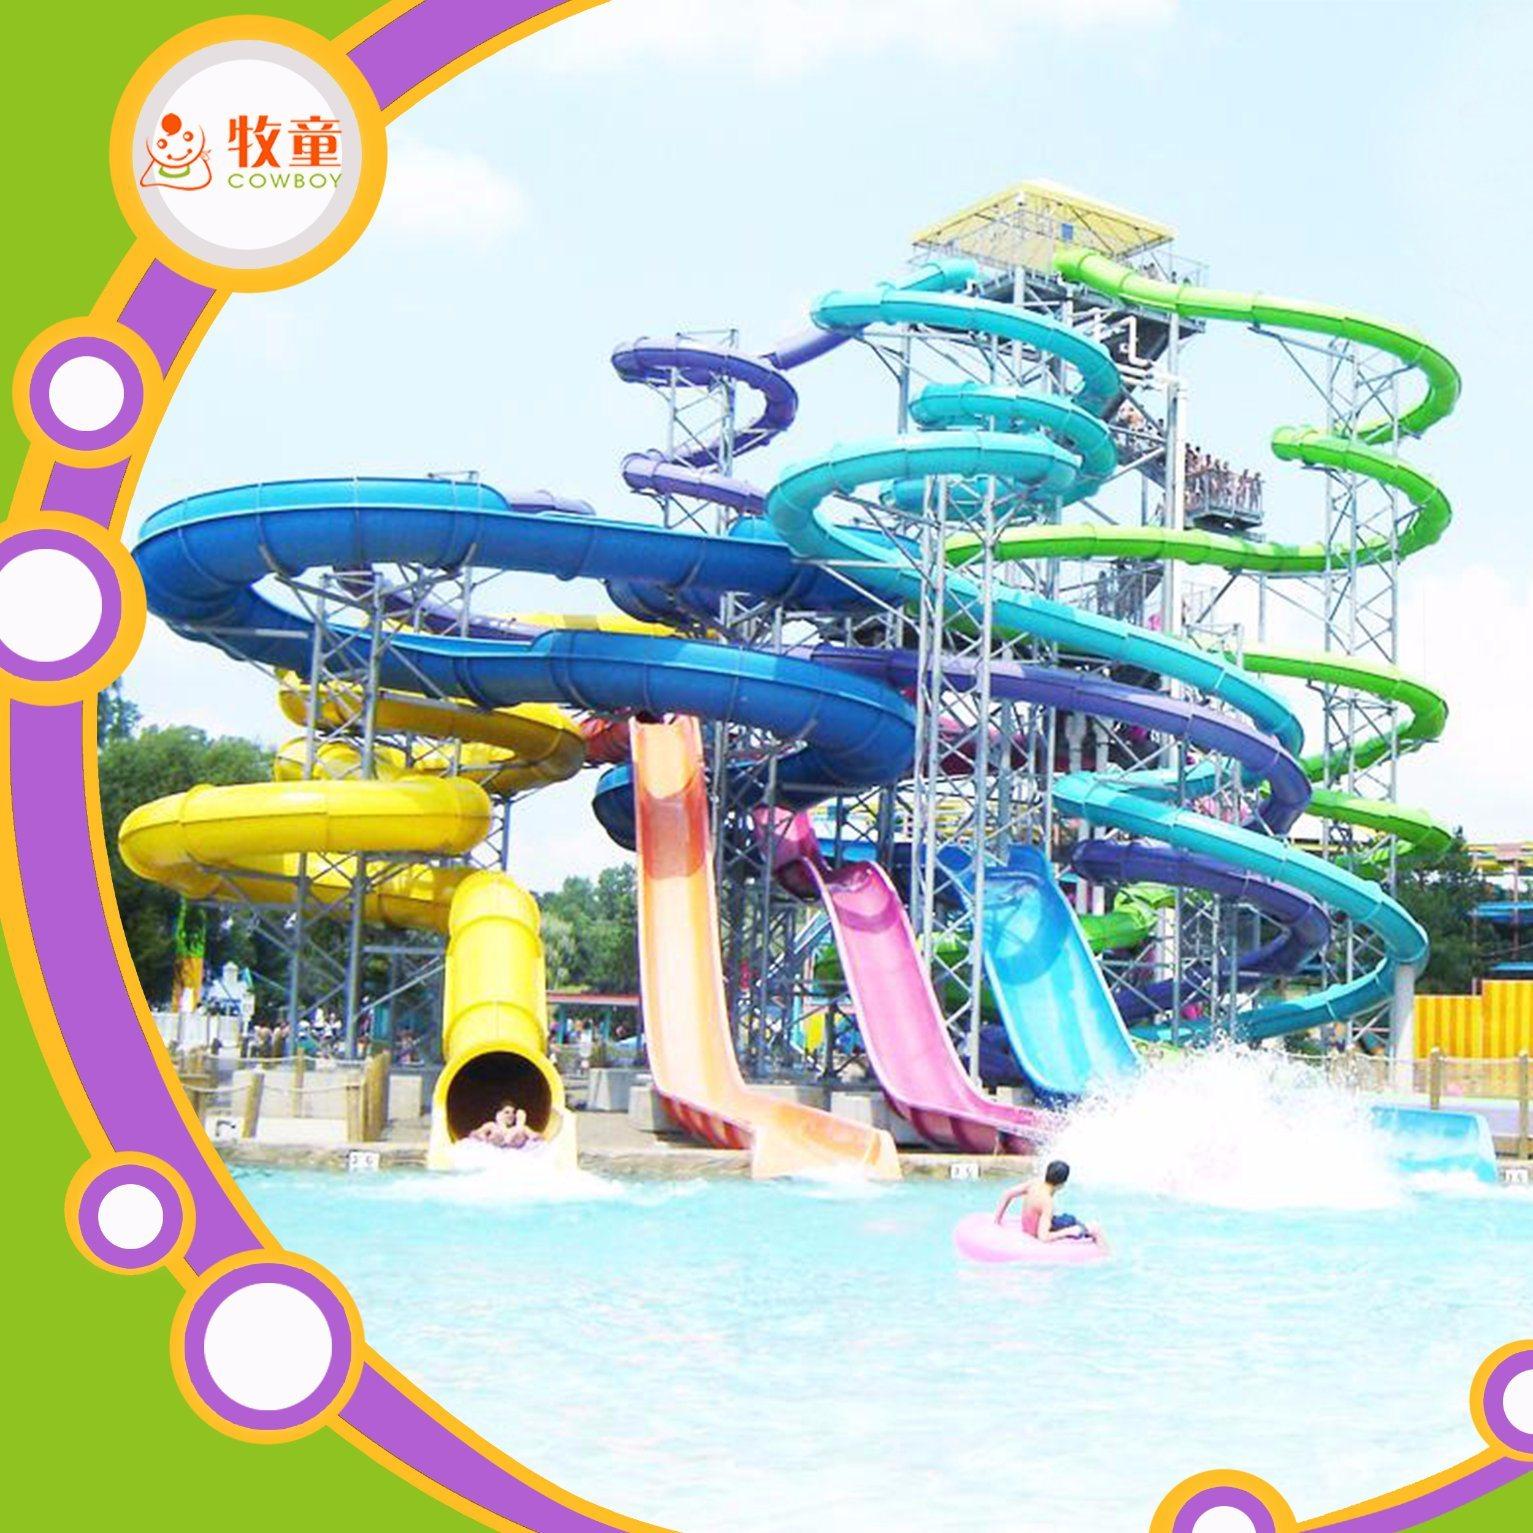 Fiberglass Water Slide Equipment for Water Amusement Park